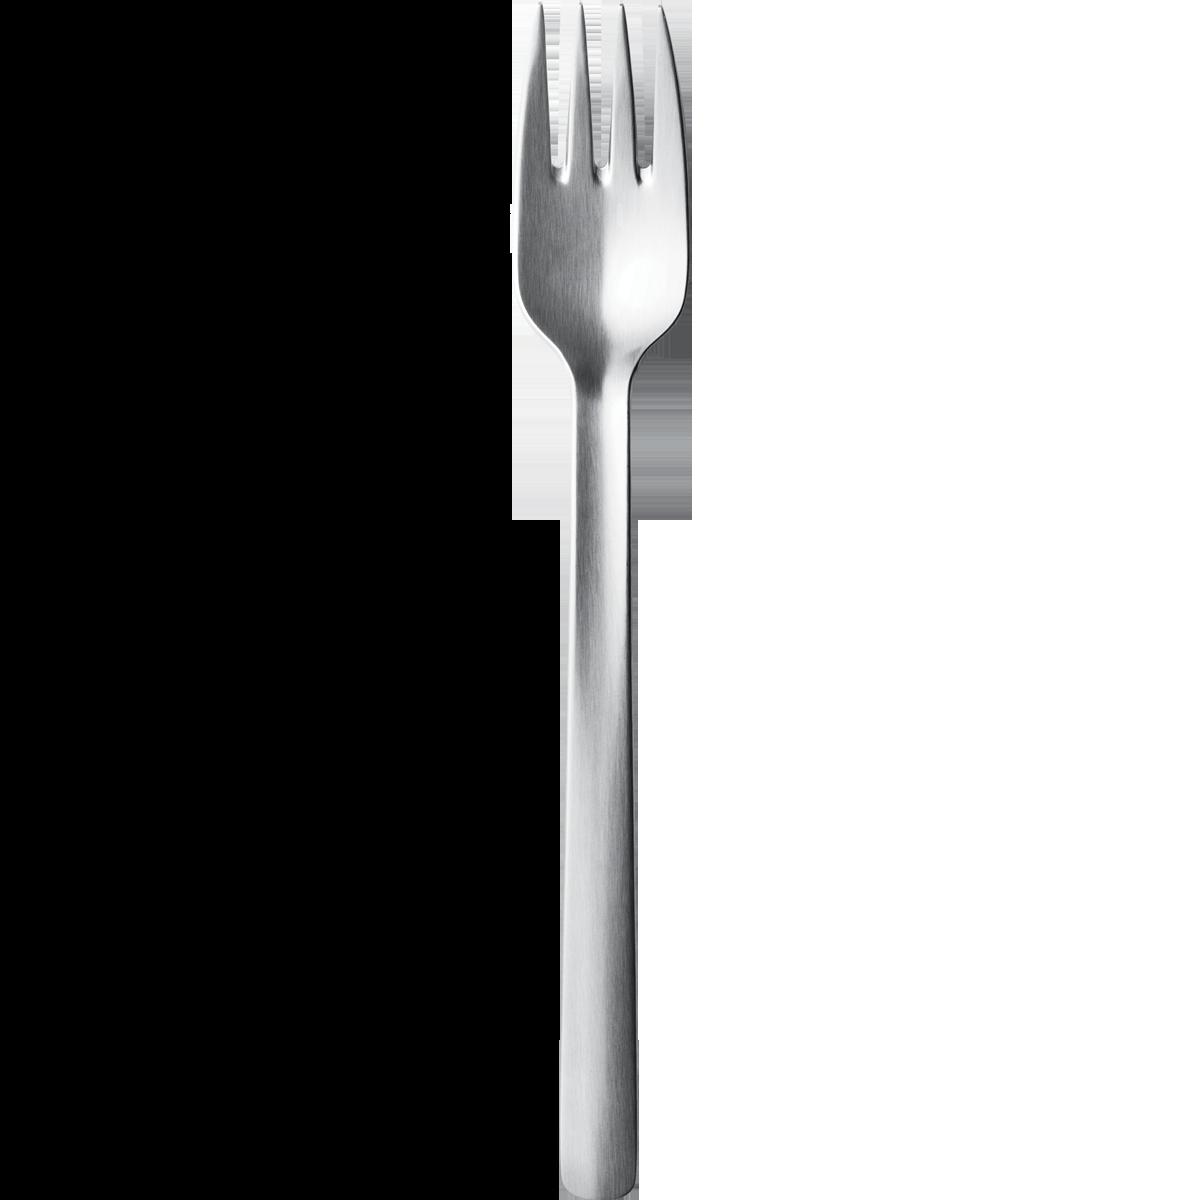 Knife clipart utensil. Fork png images